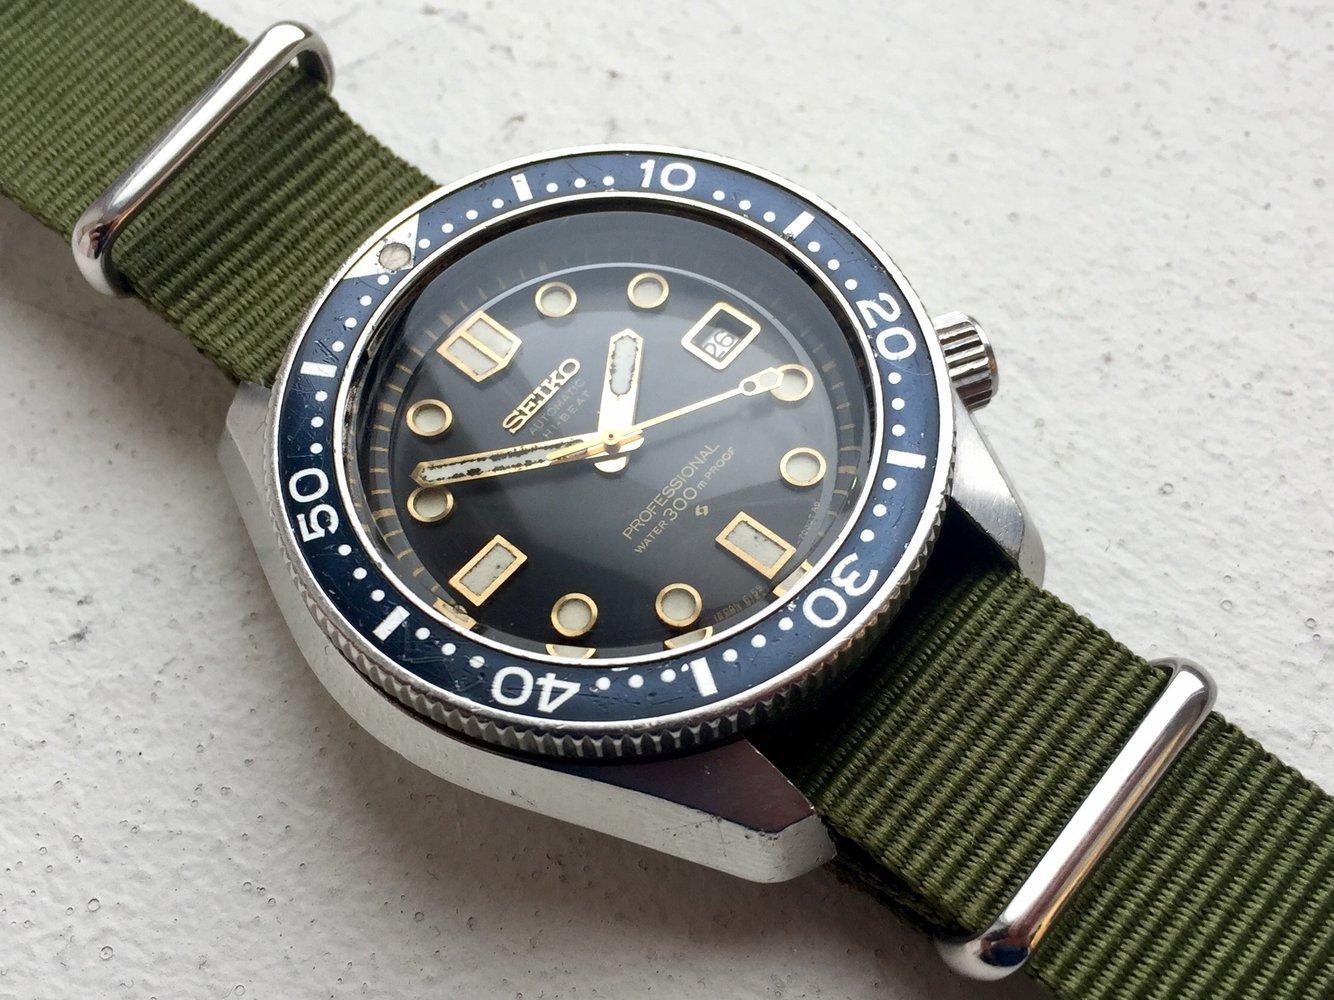 My watch (6159-7001)